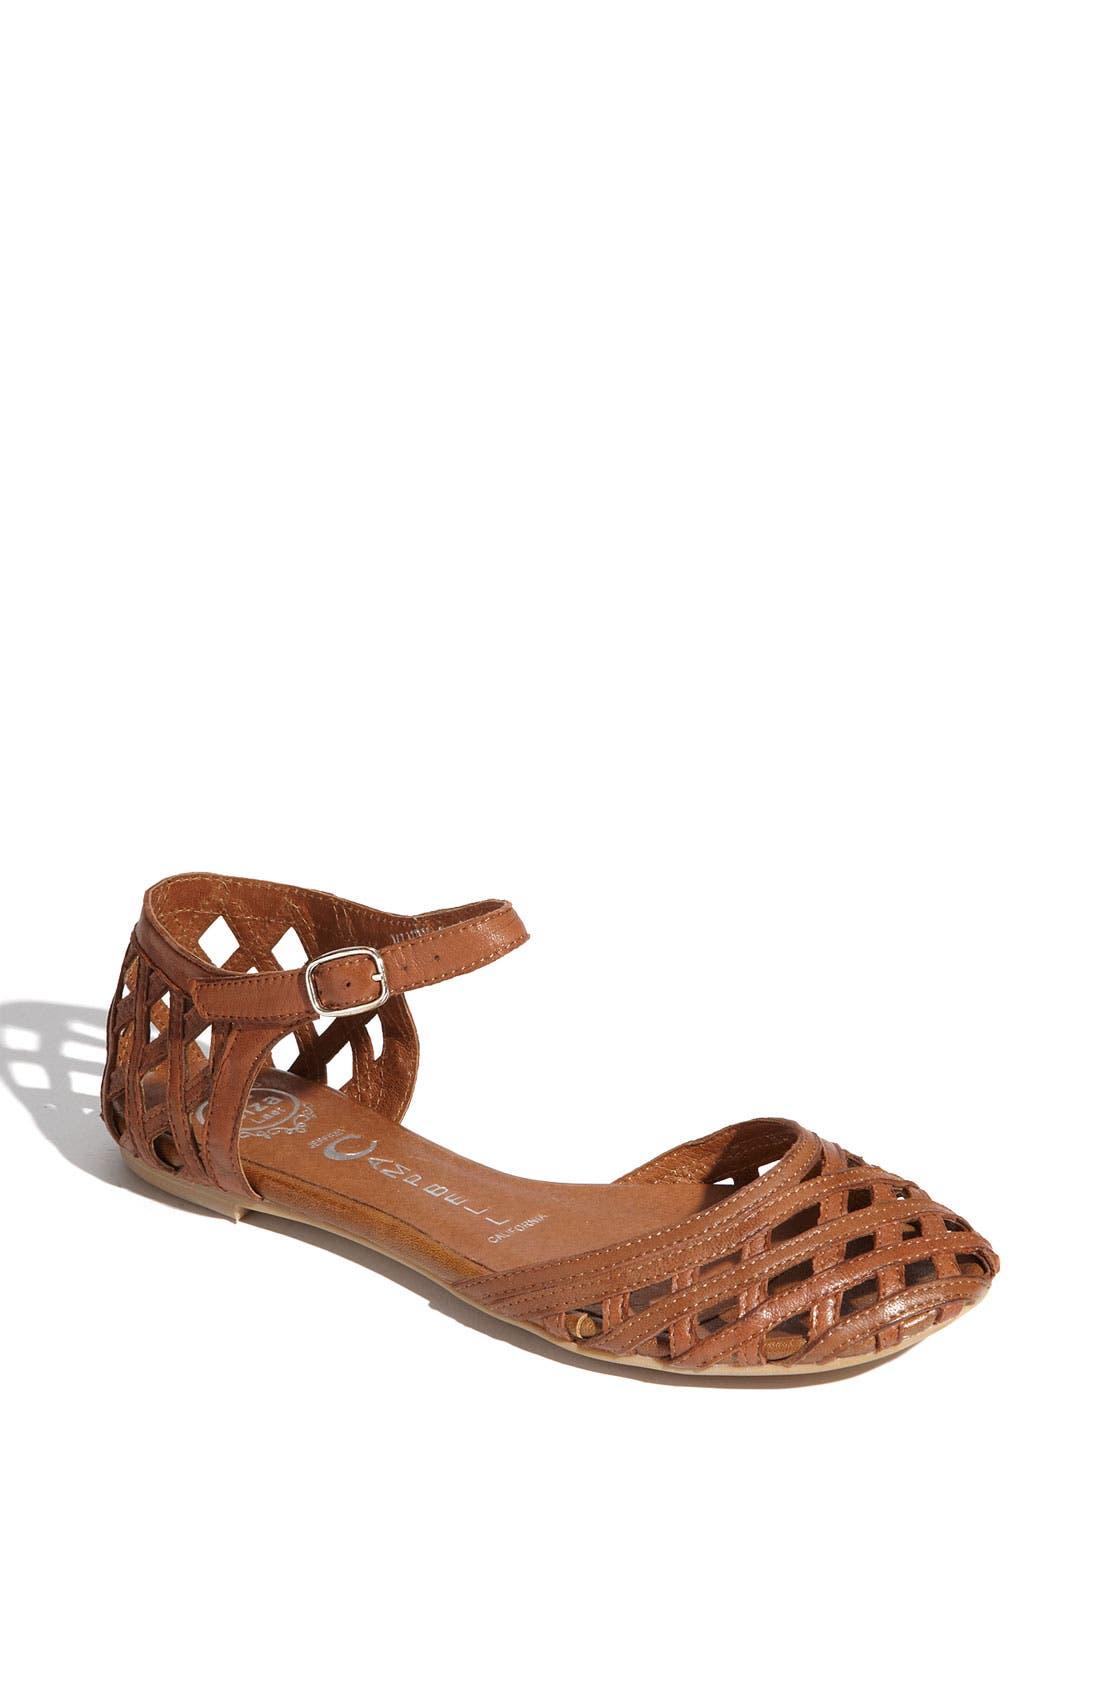 Alternate Image 1 Selected - Jeffrey Campbell 'Mindy 2' Flat Sandal